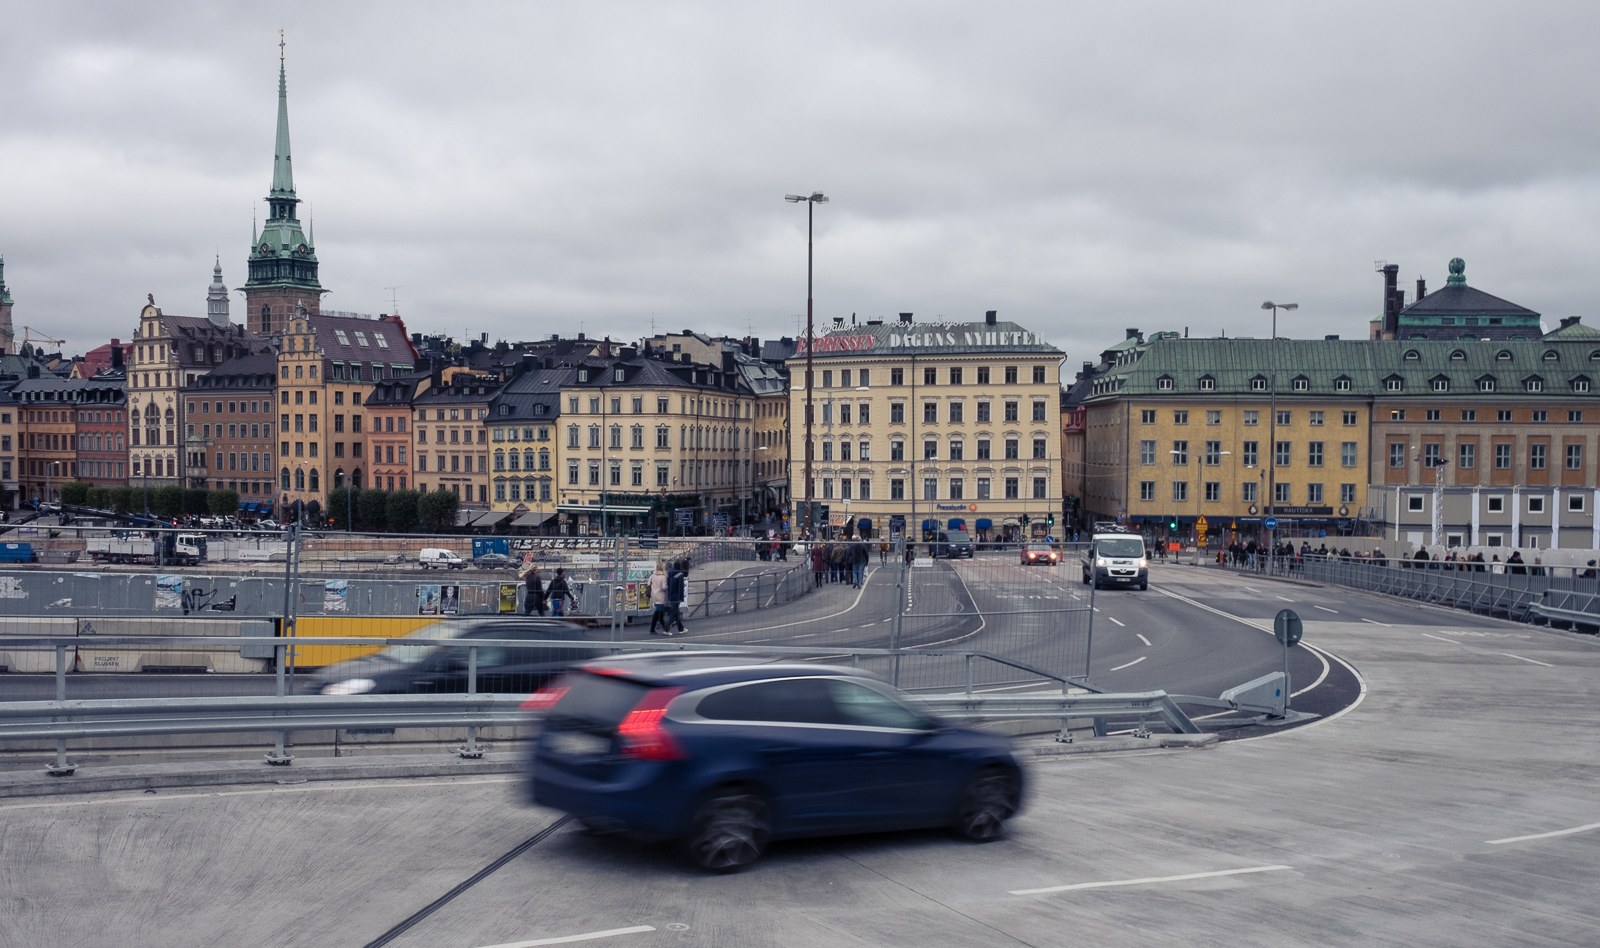 The view across Slussen back to Gamla stan, Stockholm